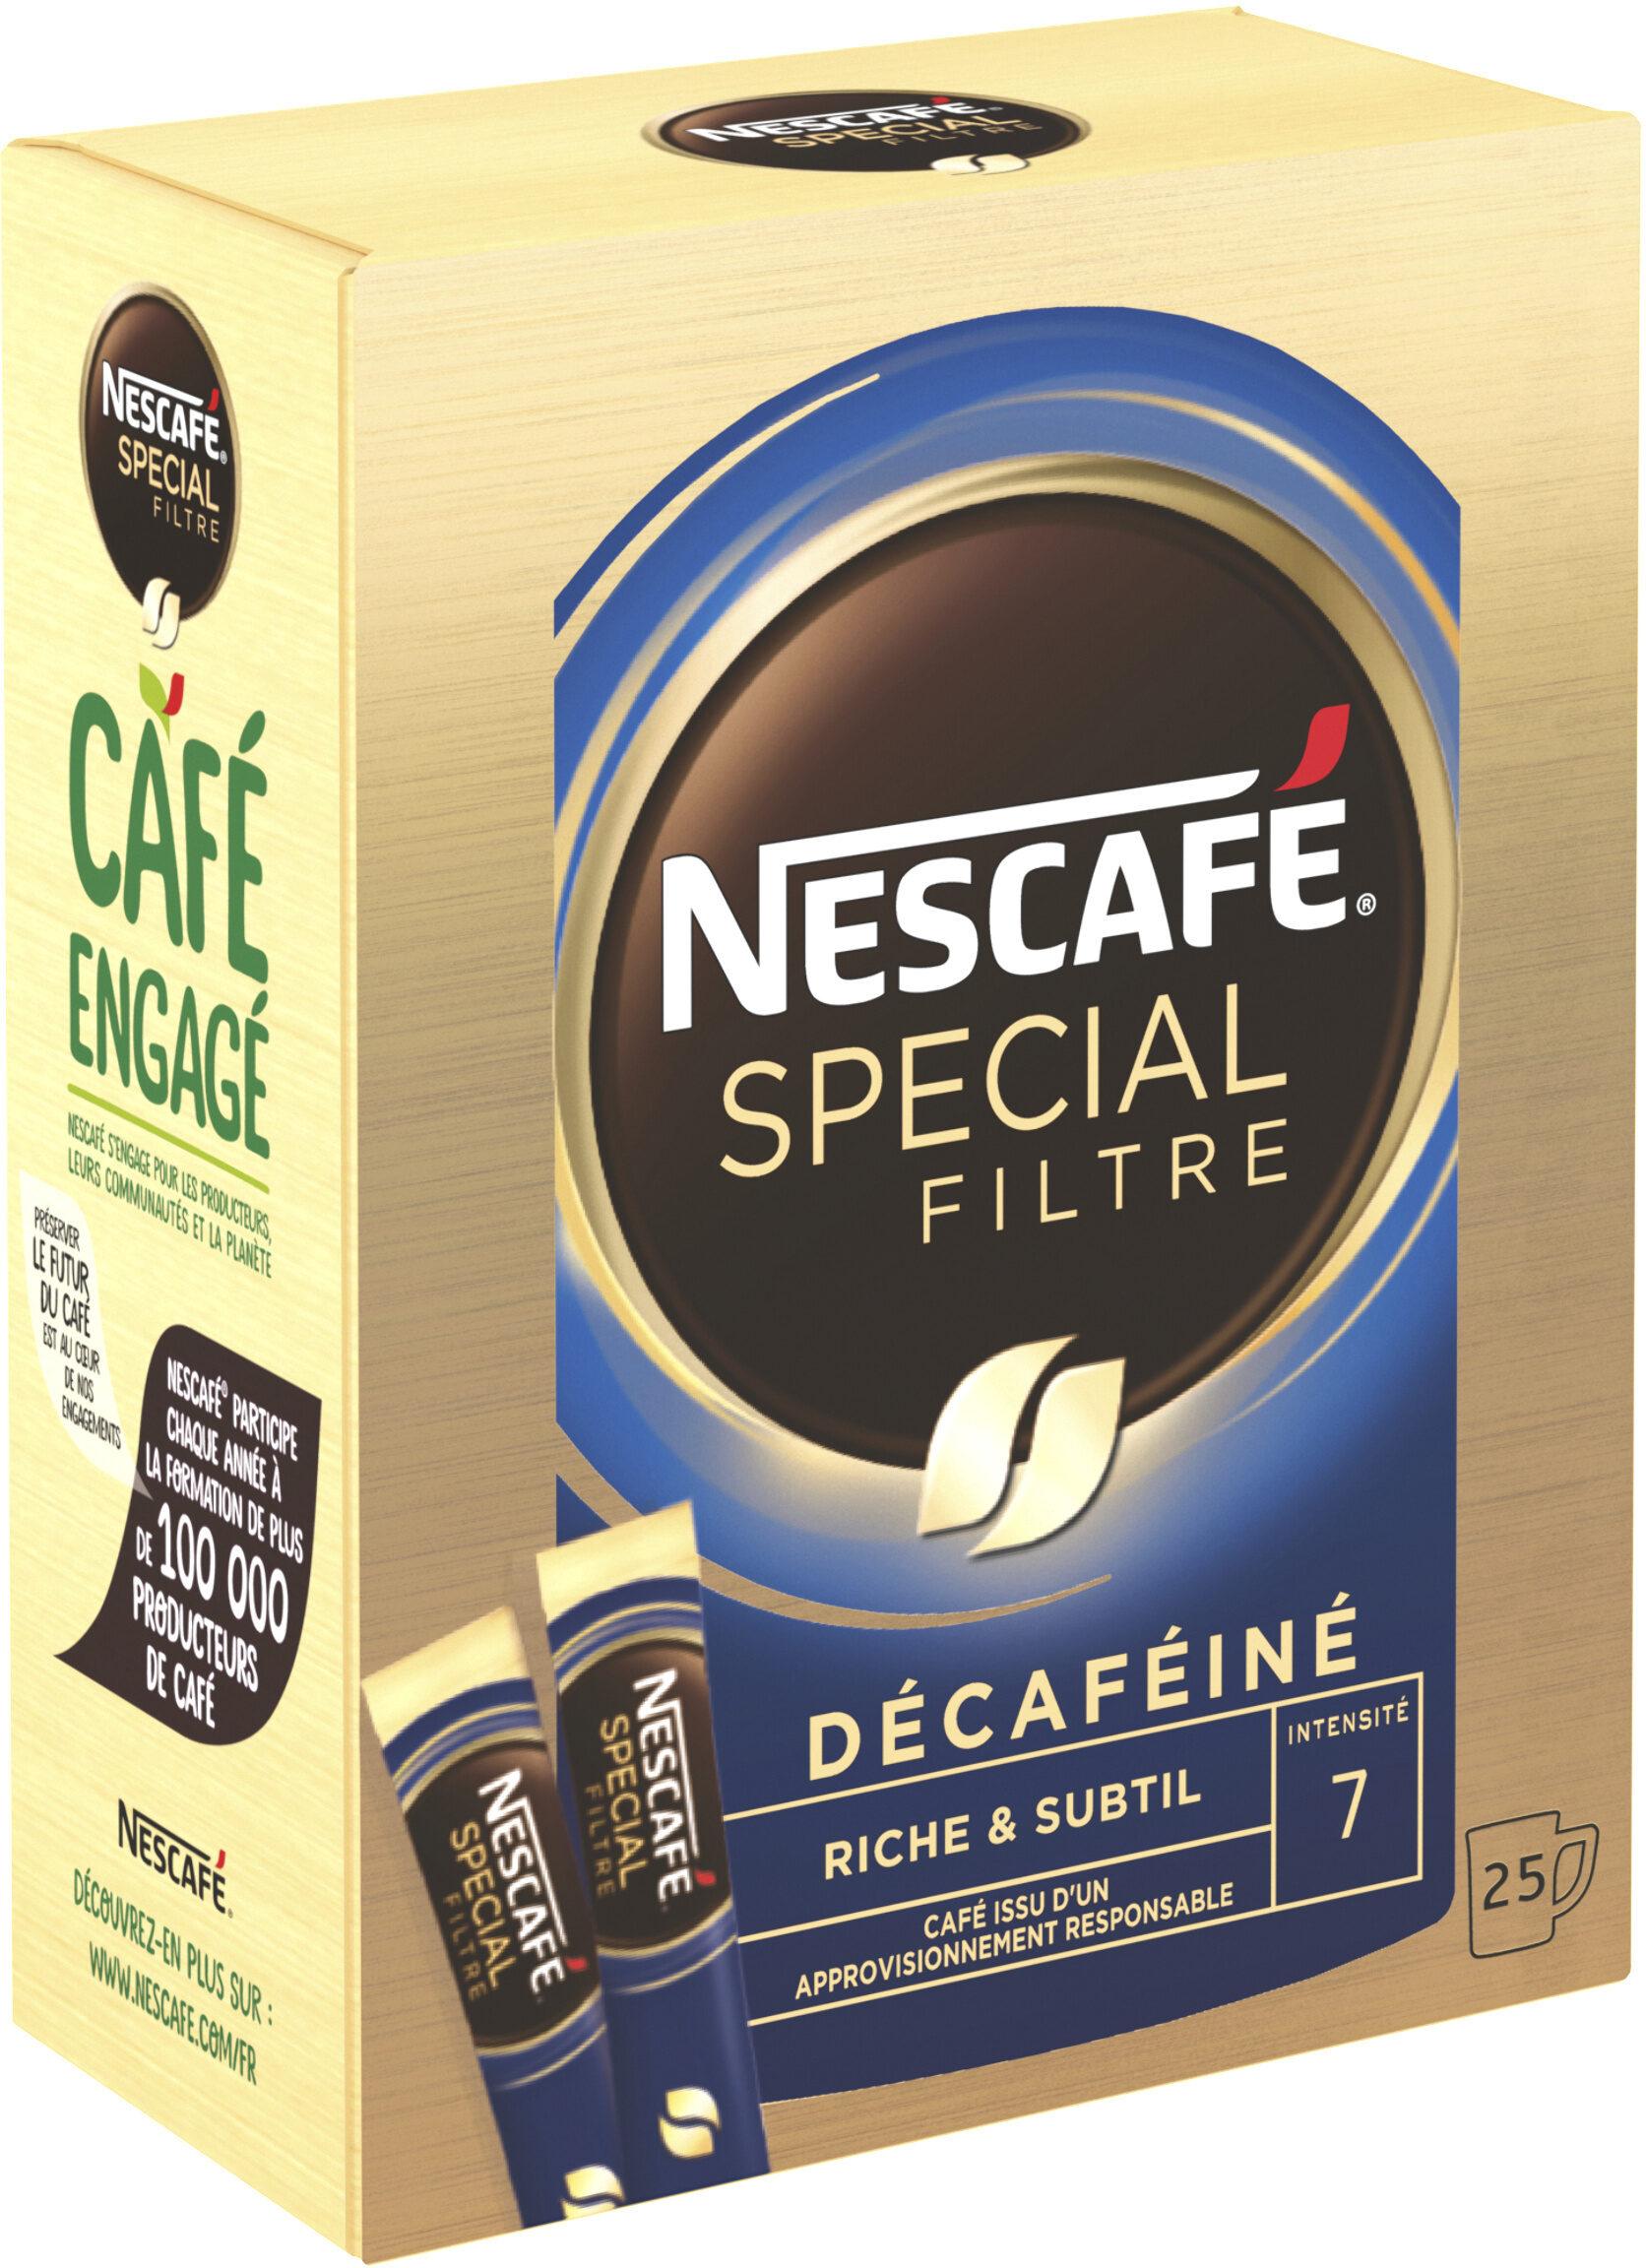 NESCAFE SPECIAL FILTRE Décaféiné, Café Soluble, Boîte de 25 Sticks - Prodotto - fr